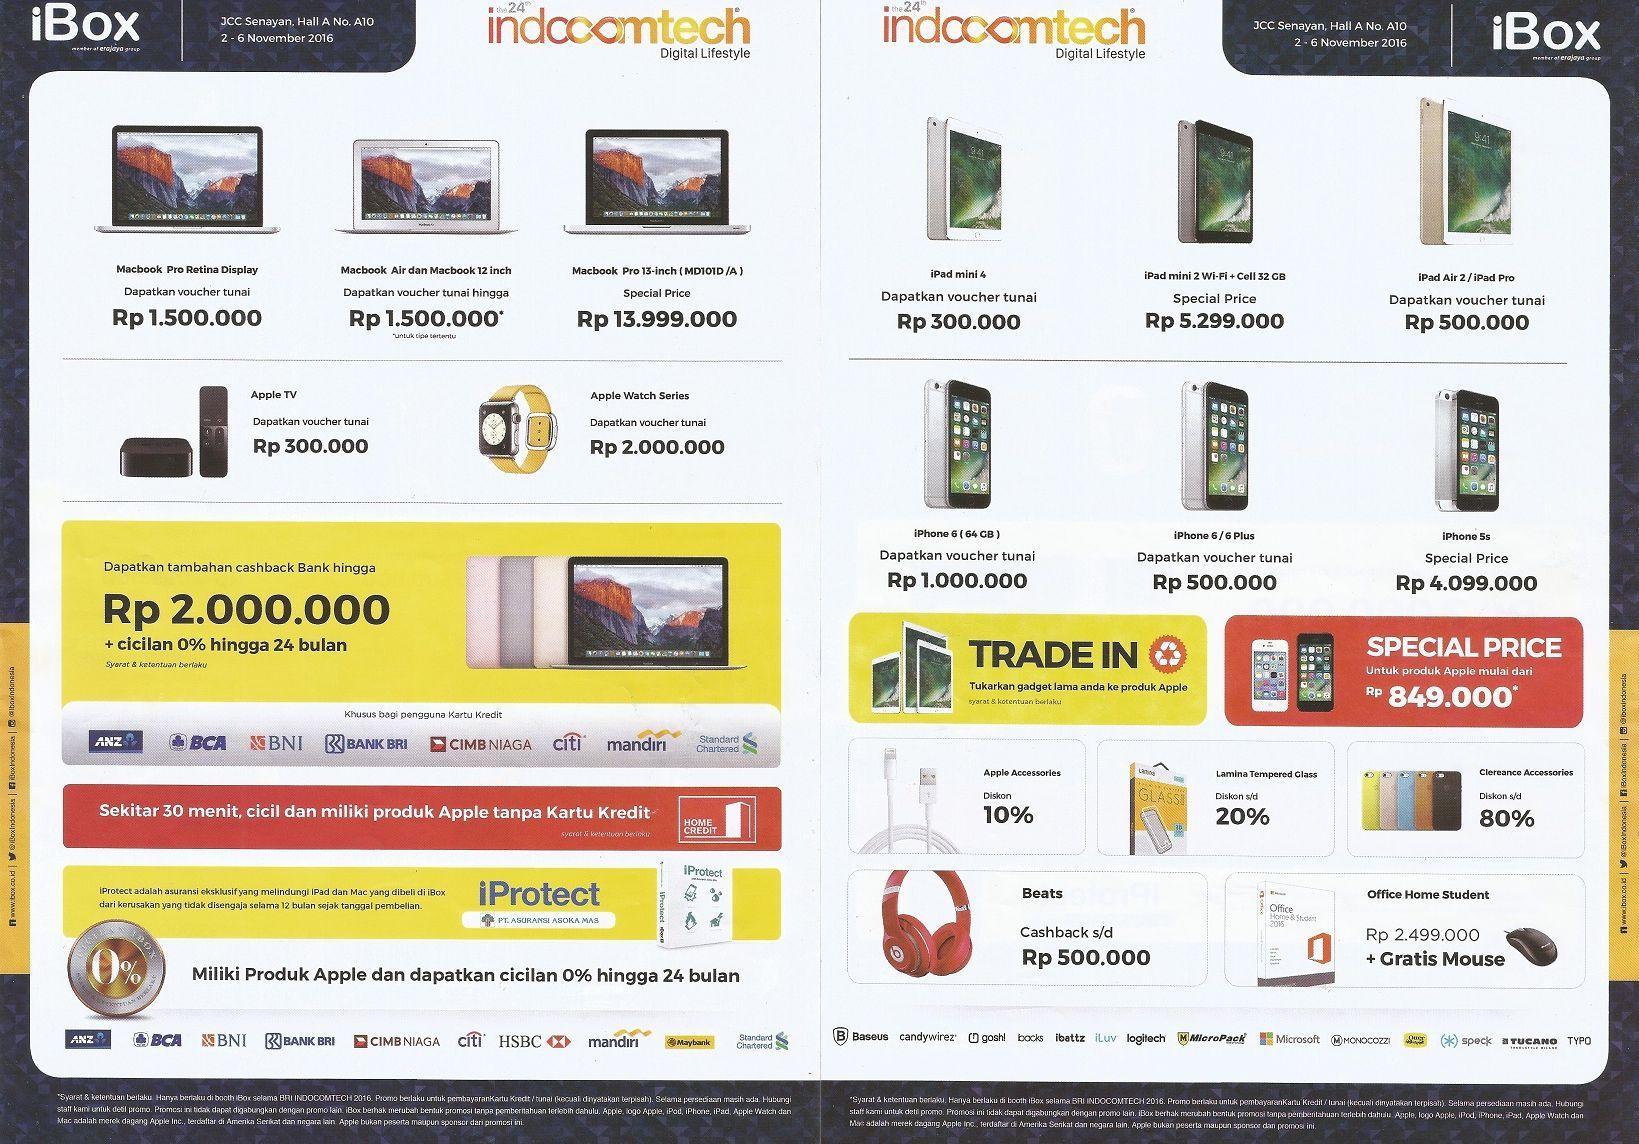 bri-indocomtech-2016-ibox